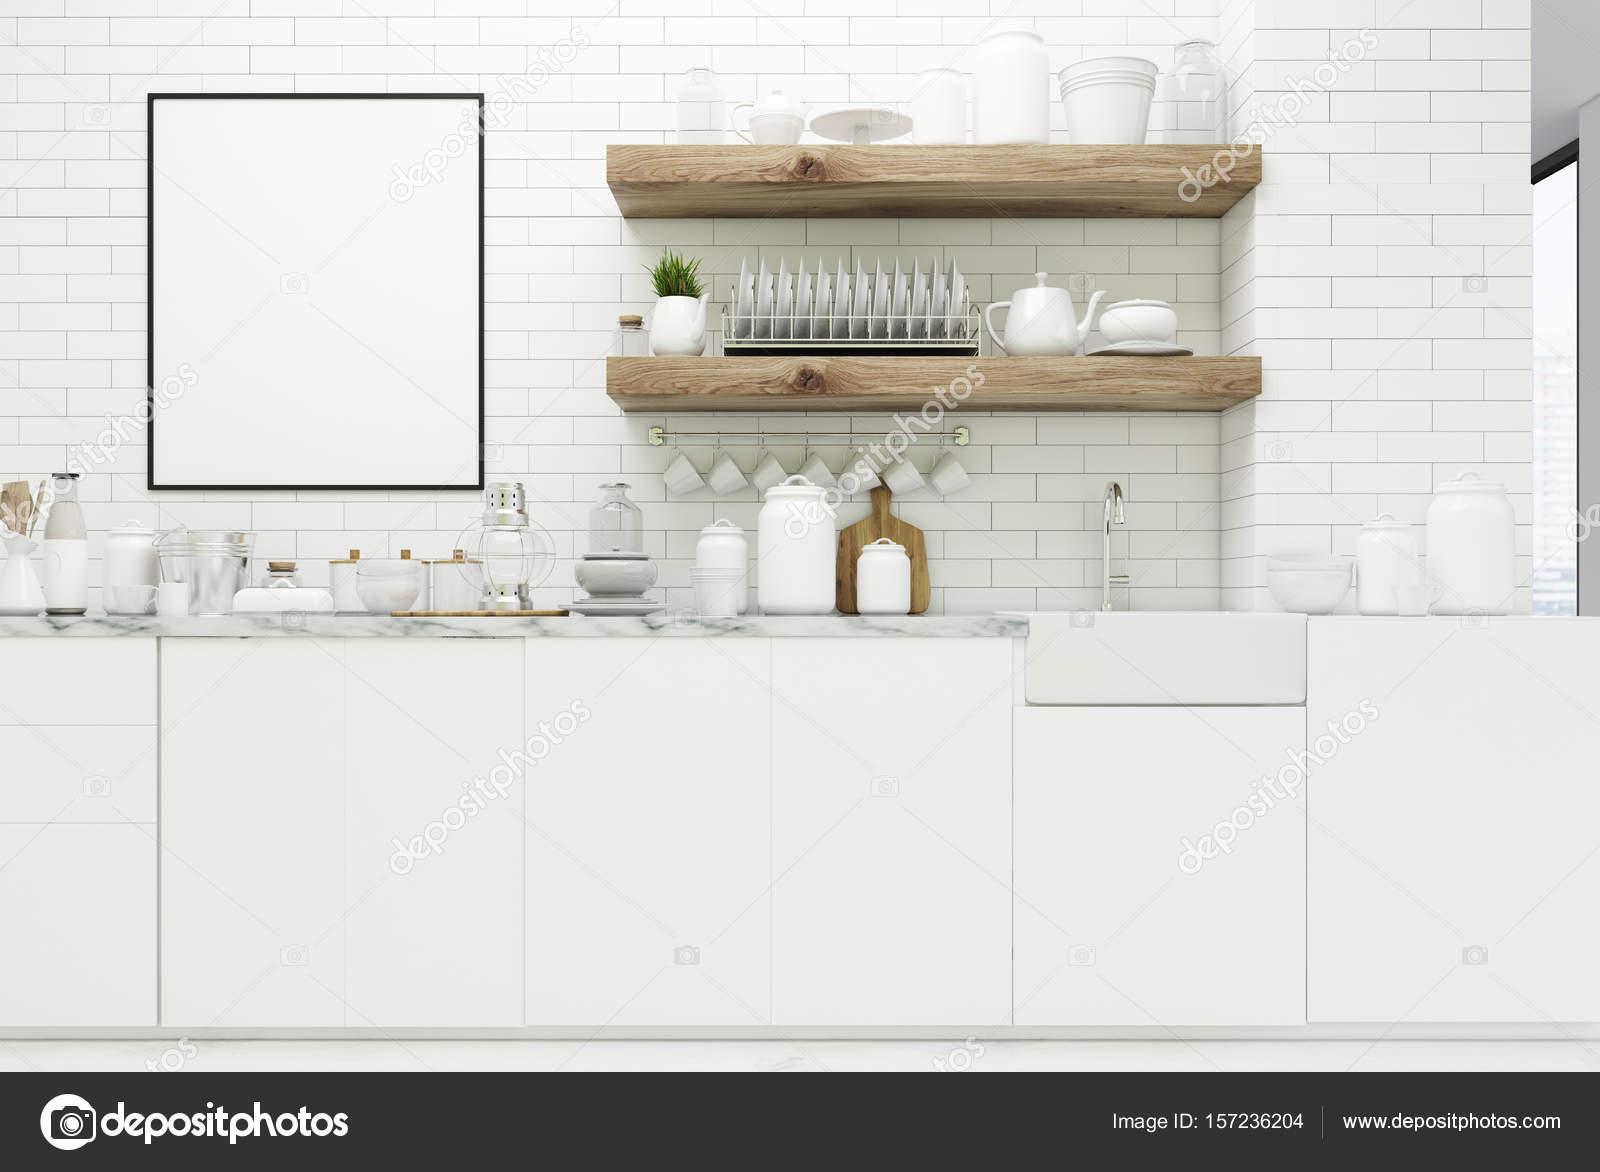 Wandplank keuken awesome keuken planken keuken van houten osb